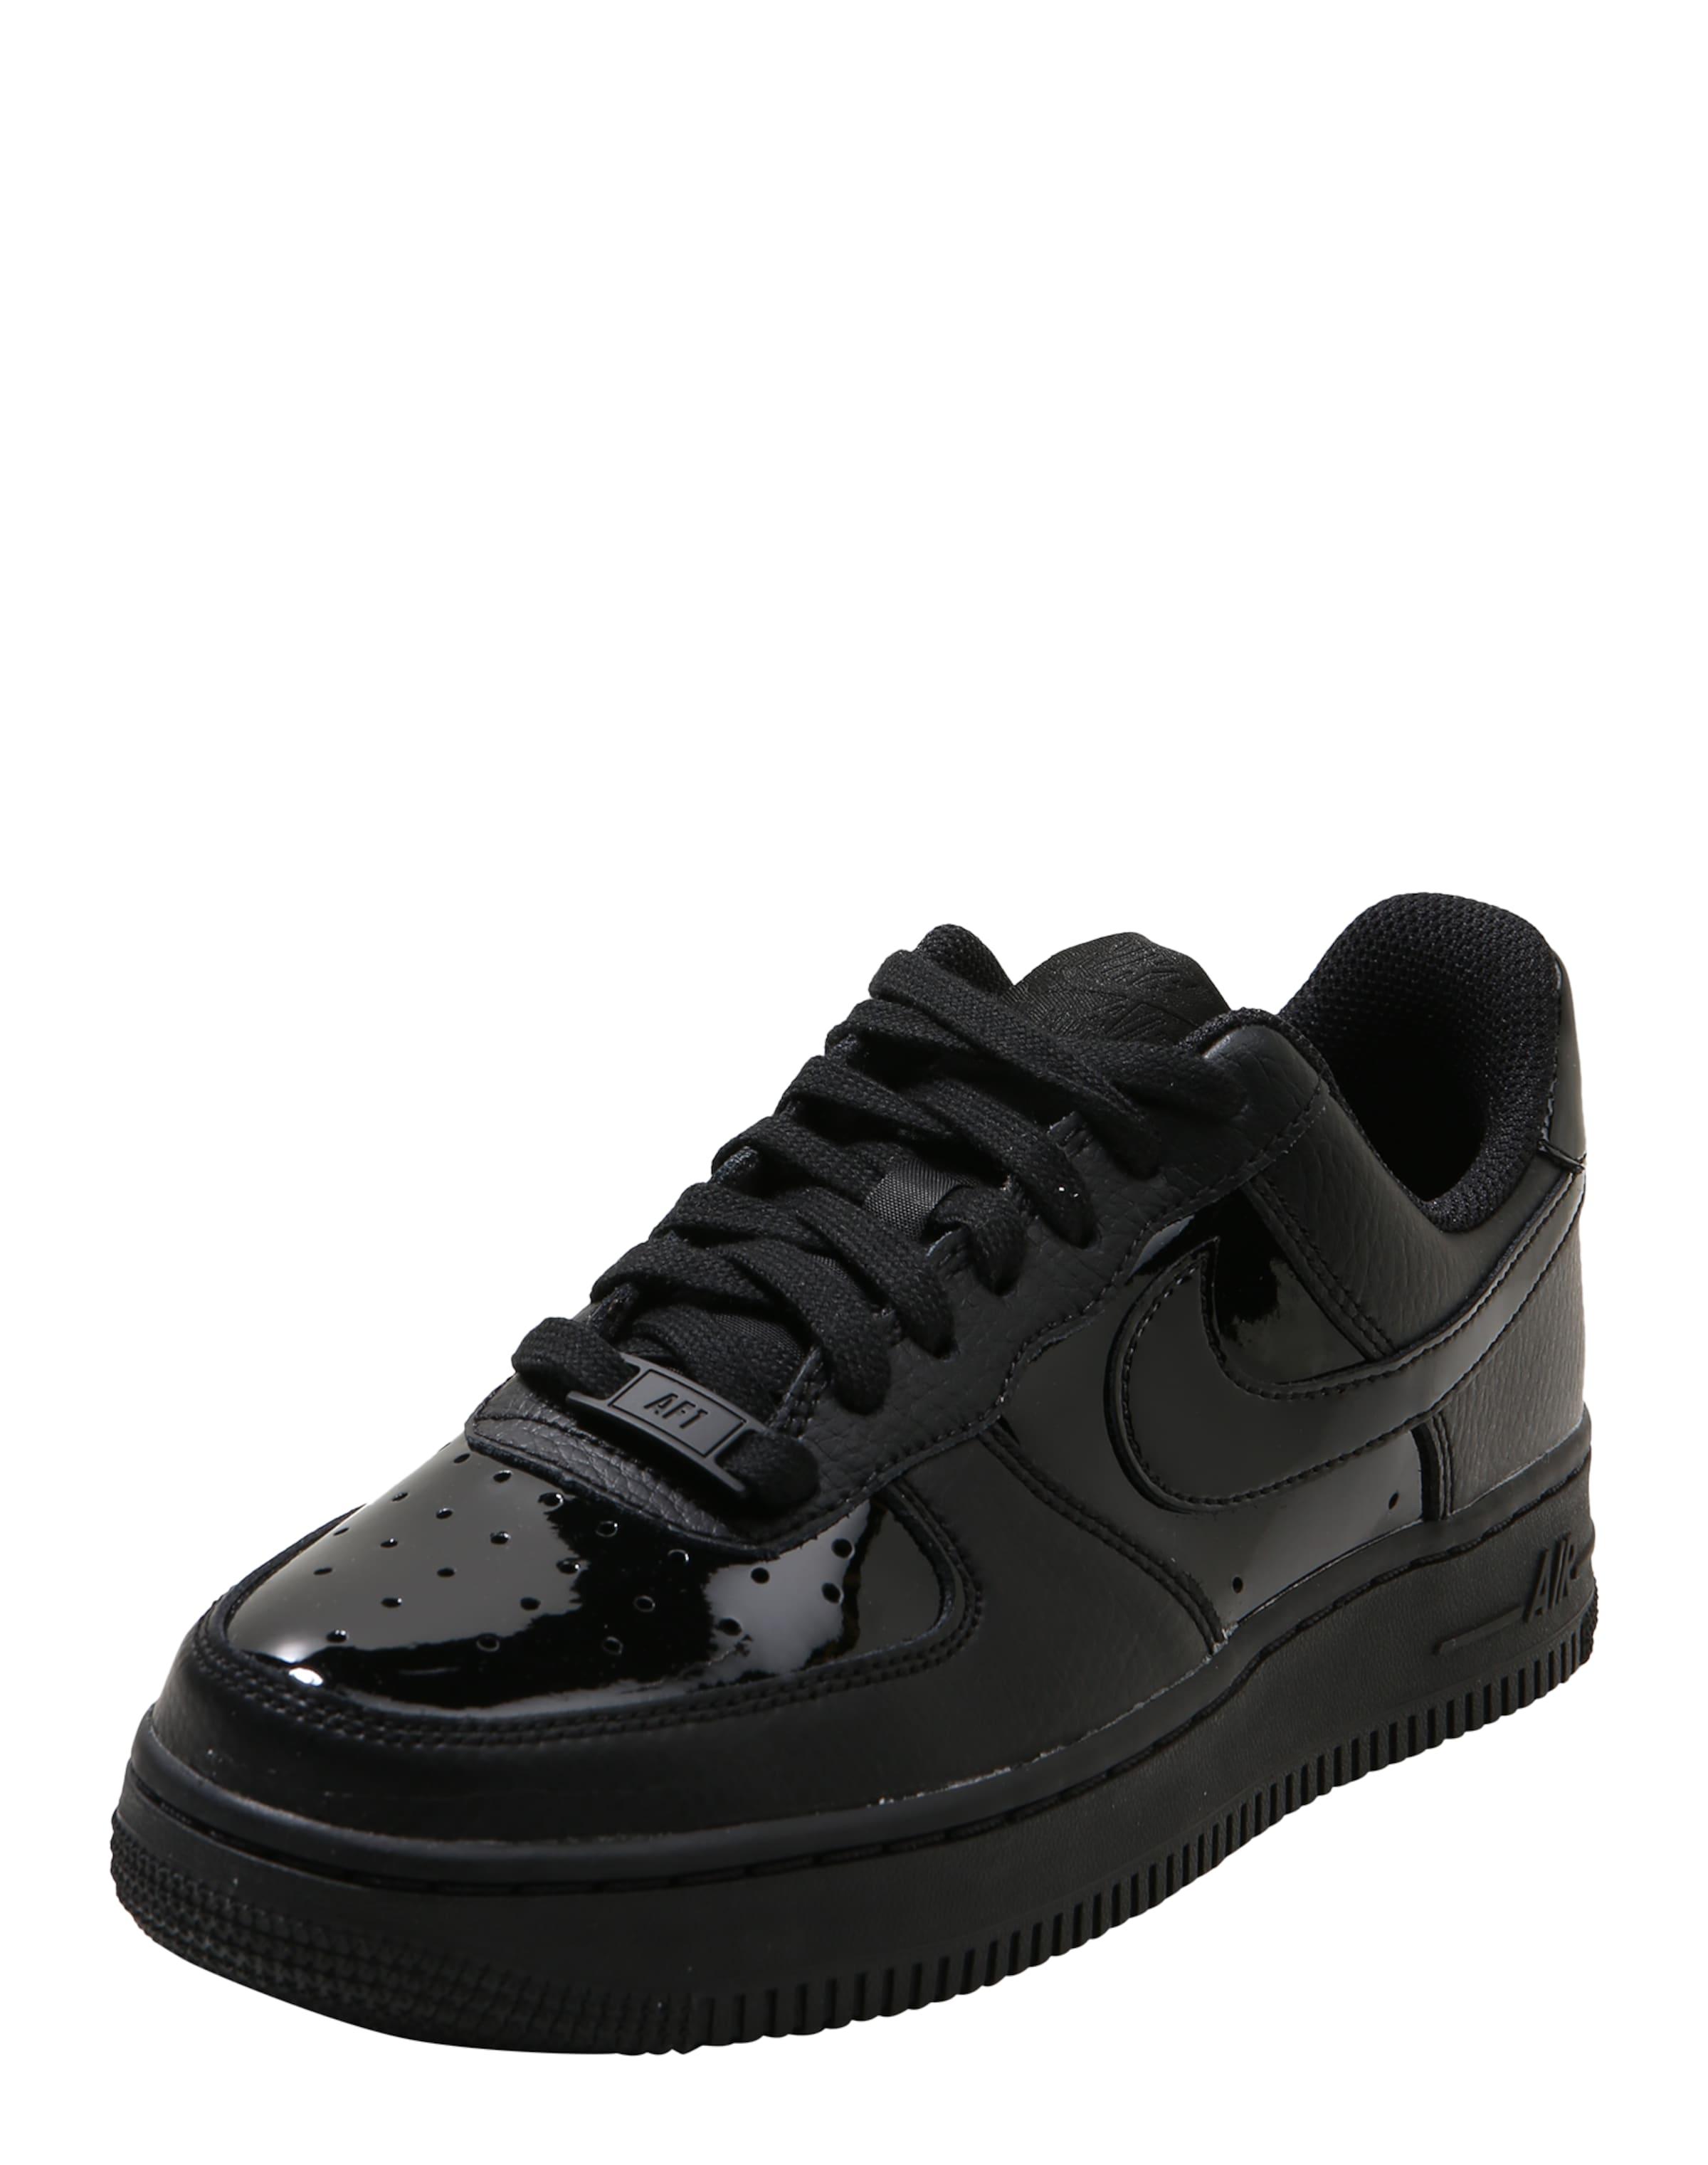 Nike Sportswear | TurnschuheLow  07 Air force 1  07  9755c5